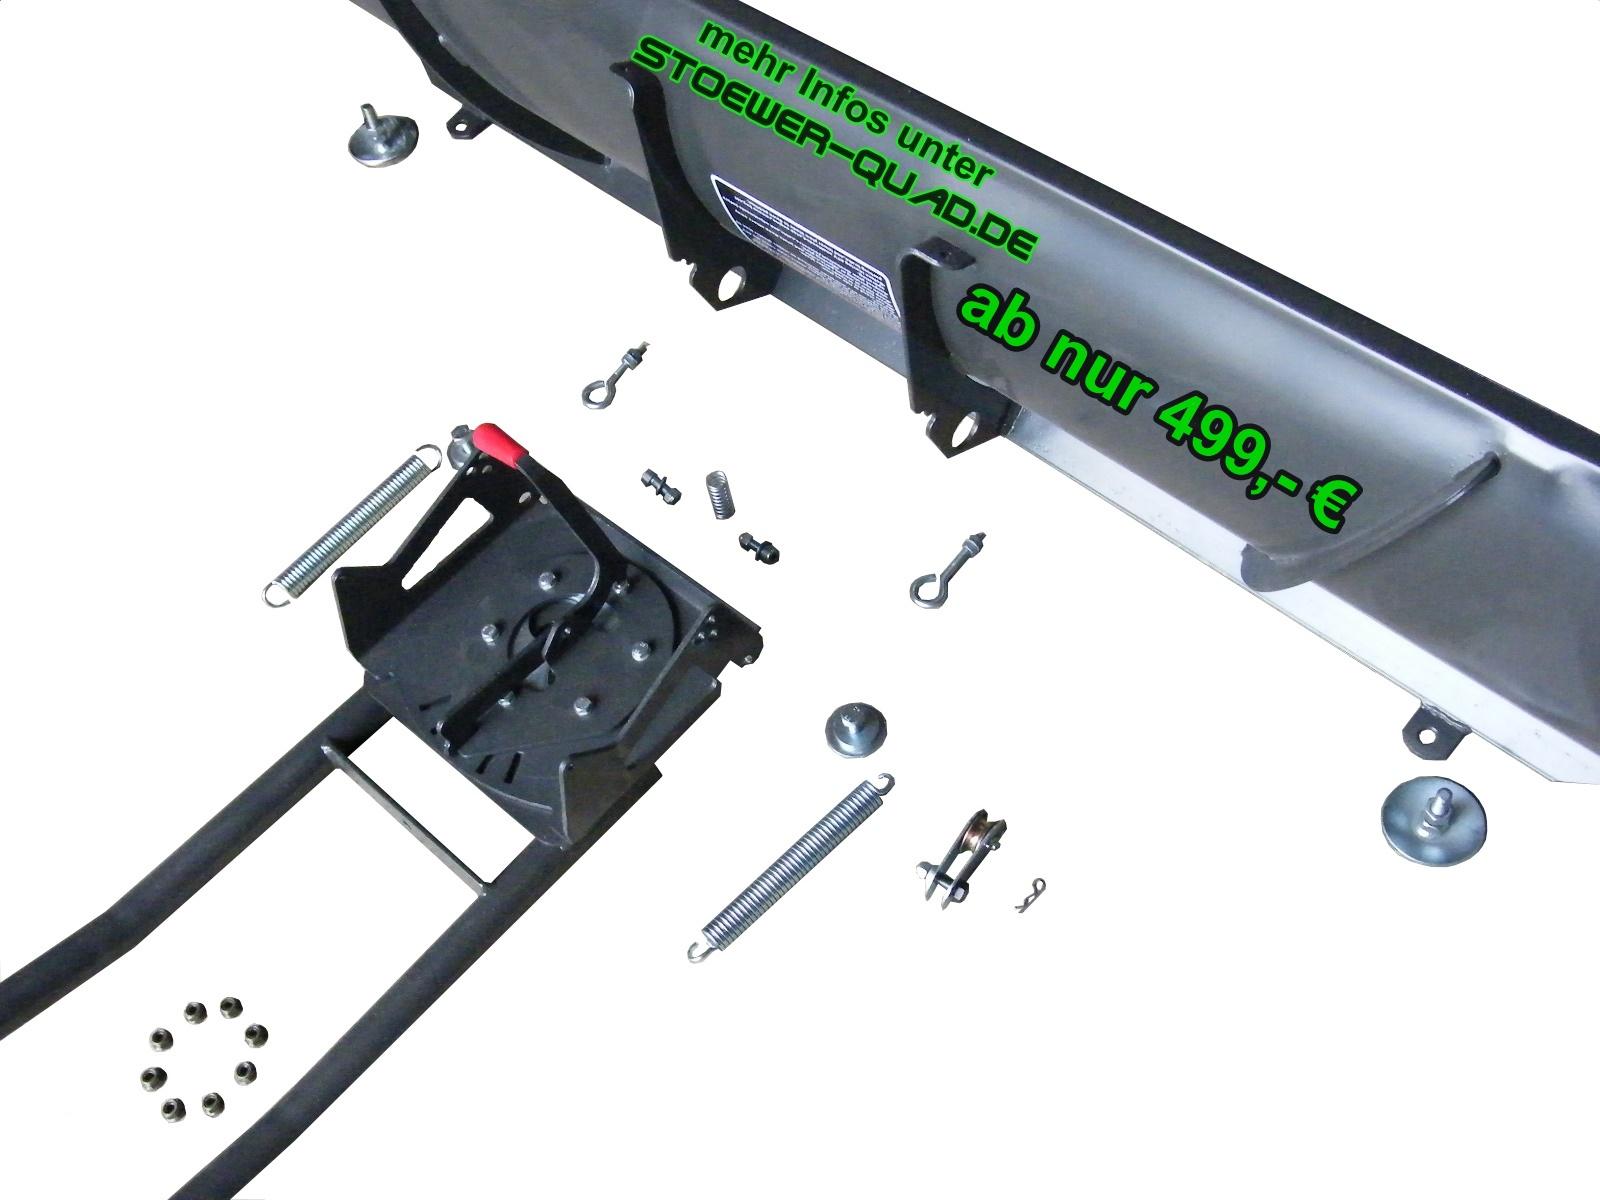 http://quad-schneeschild.quadundmotorrad.de/Ebay/Teile%20010-Schneeschild%20152cm%20Blank-stoewer.jpg